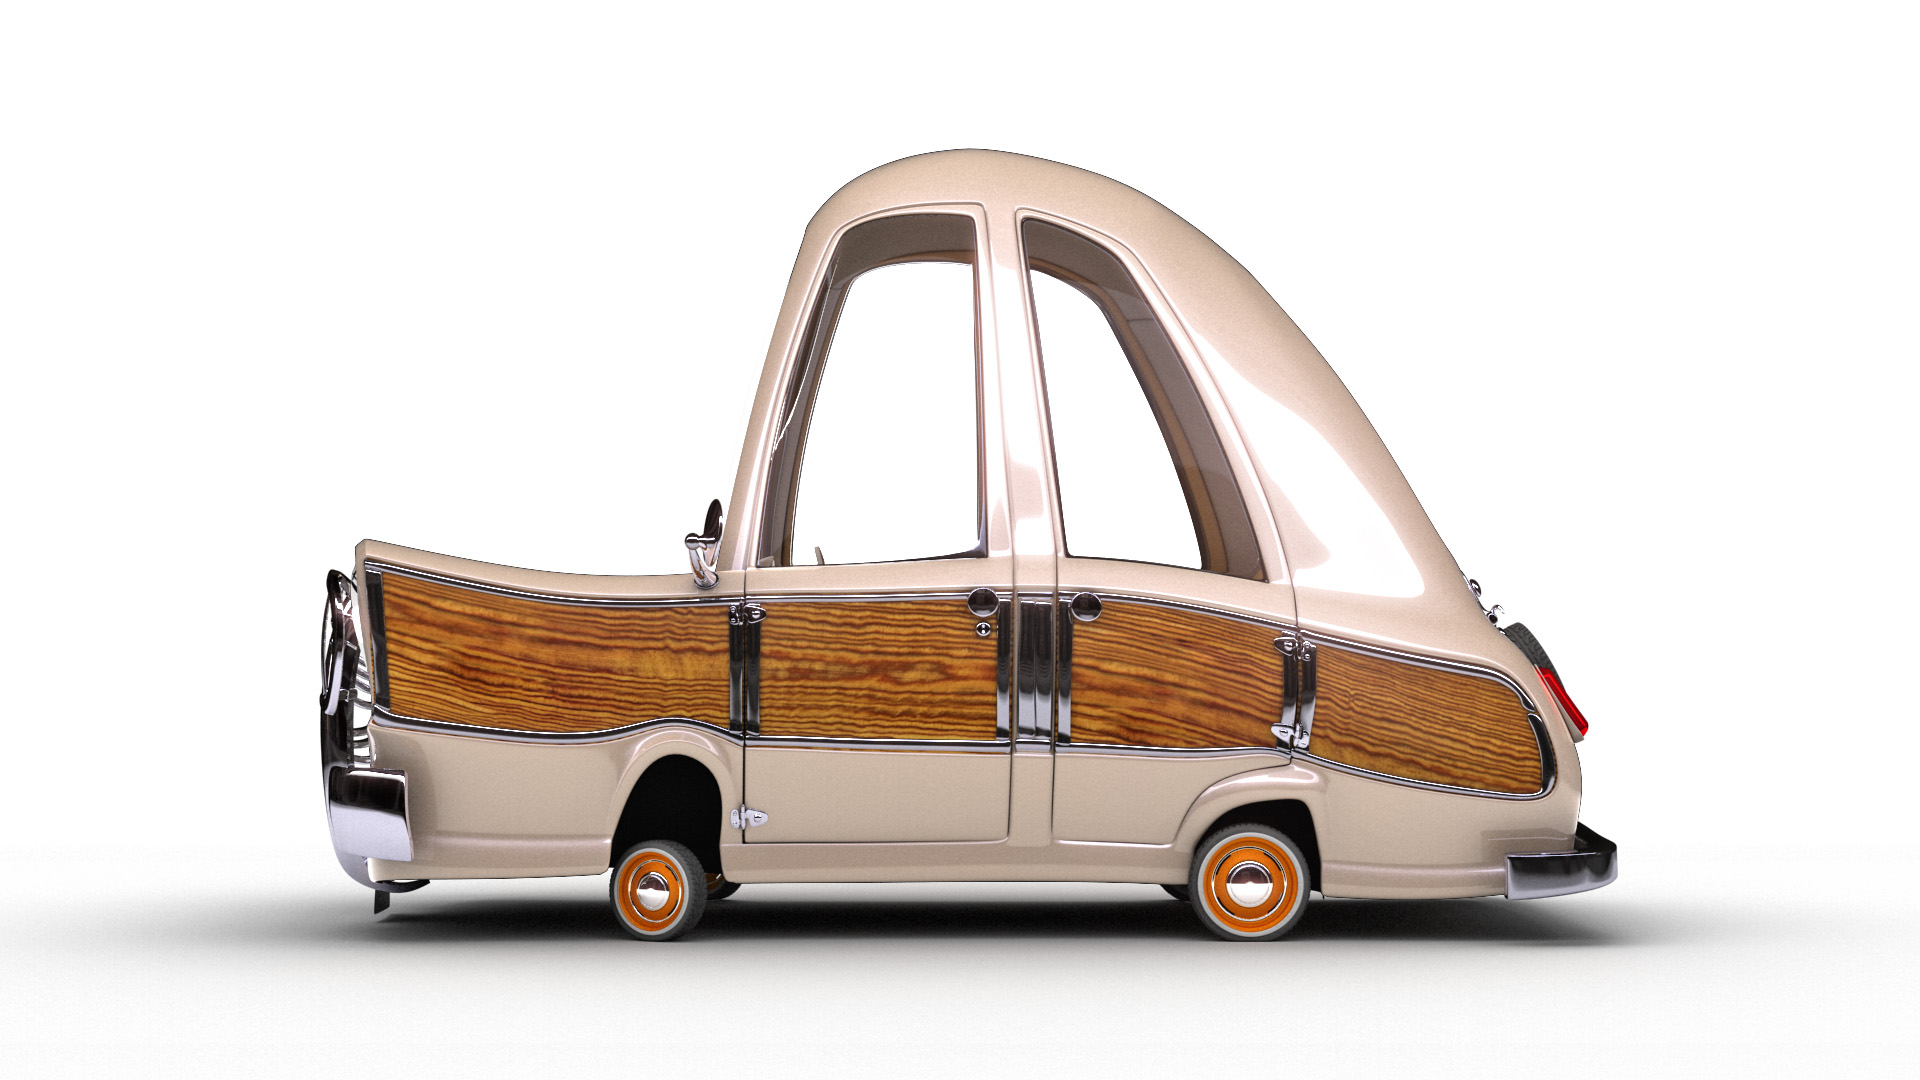 toblerone_car_image01